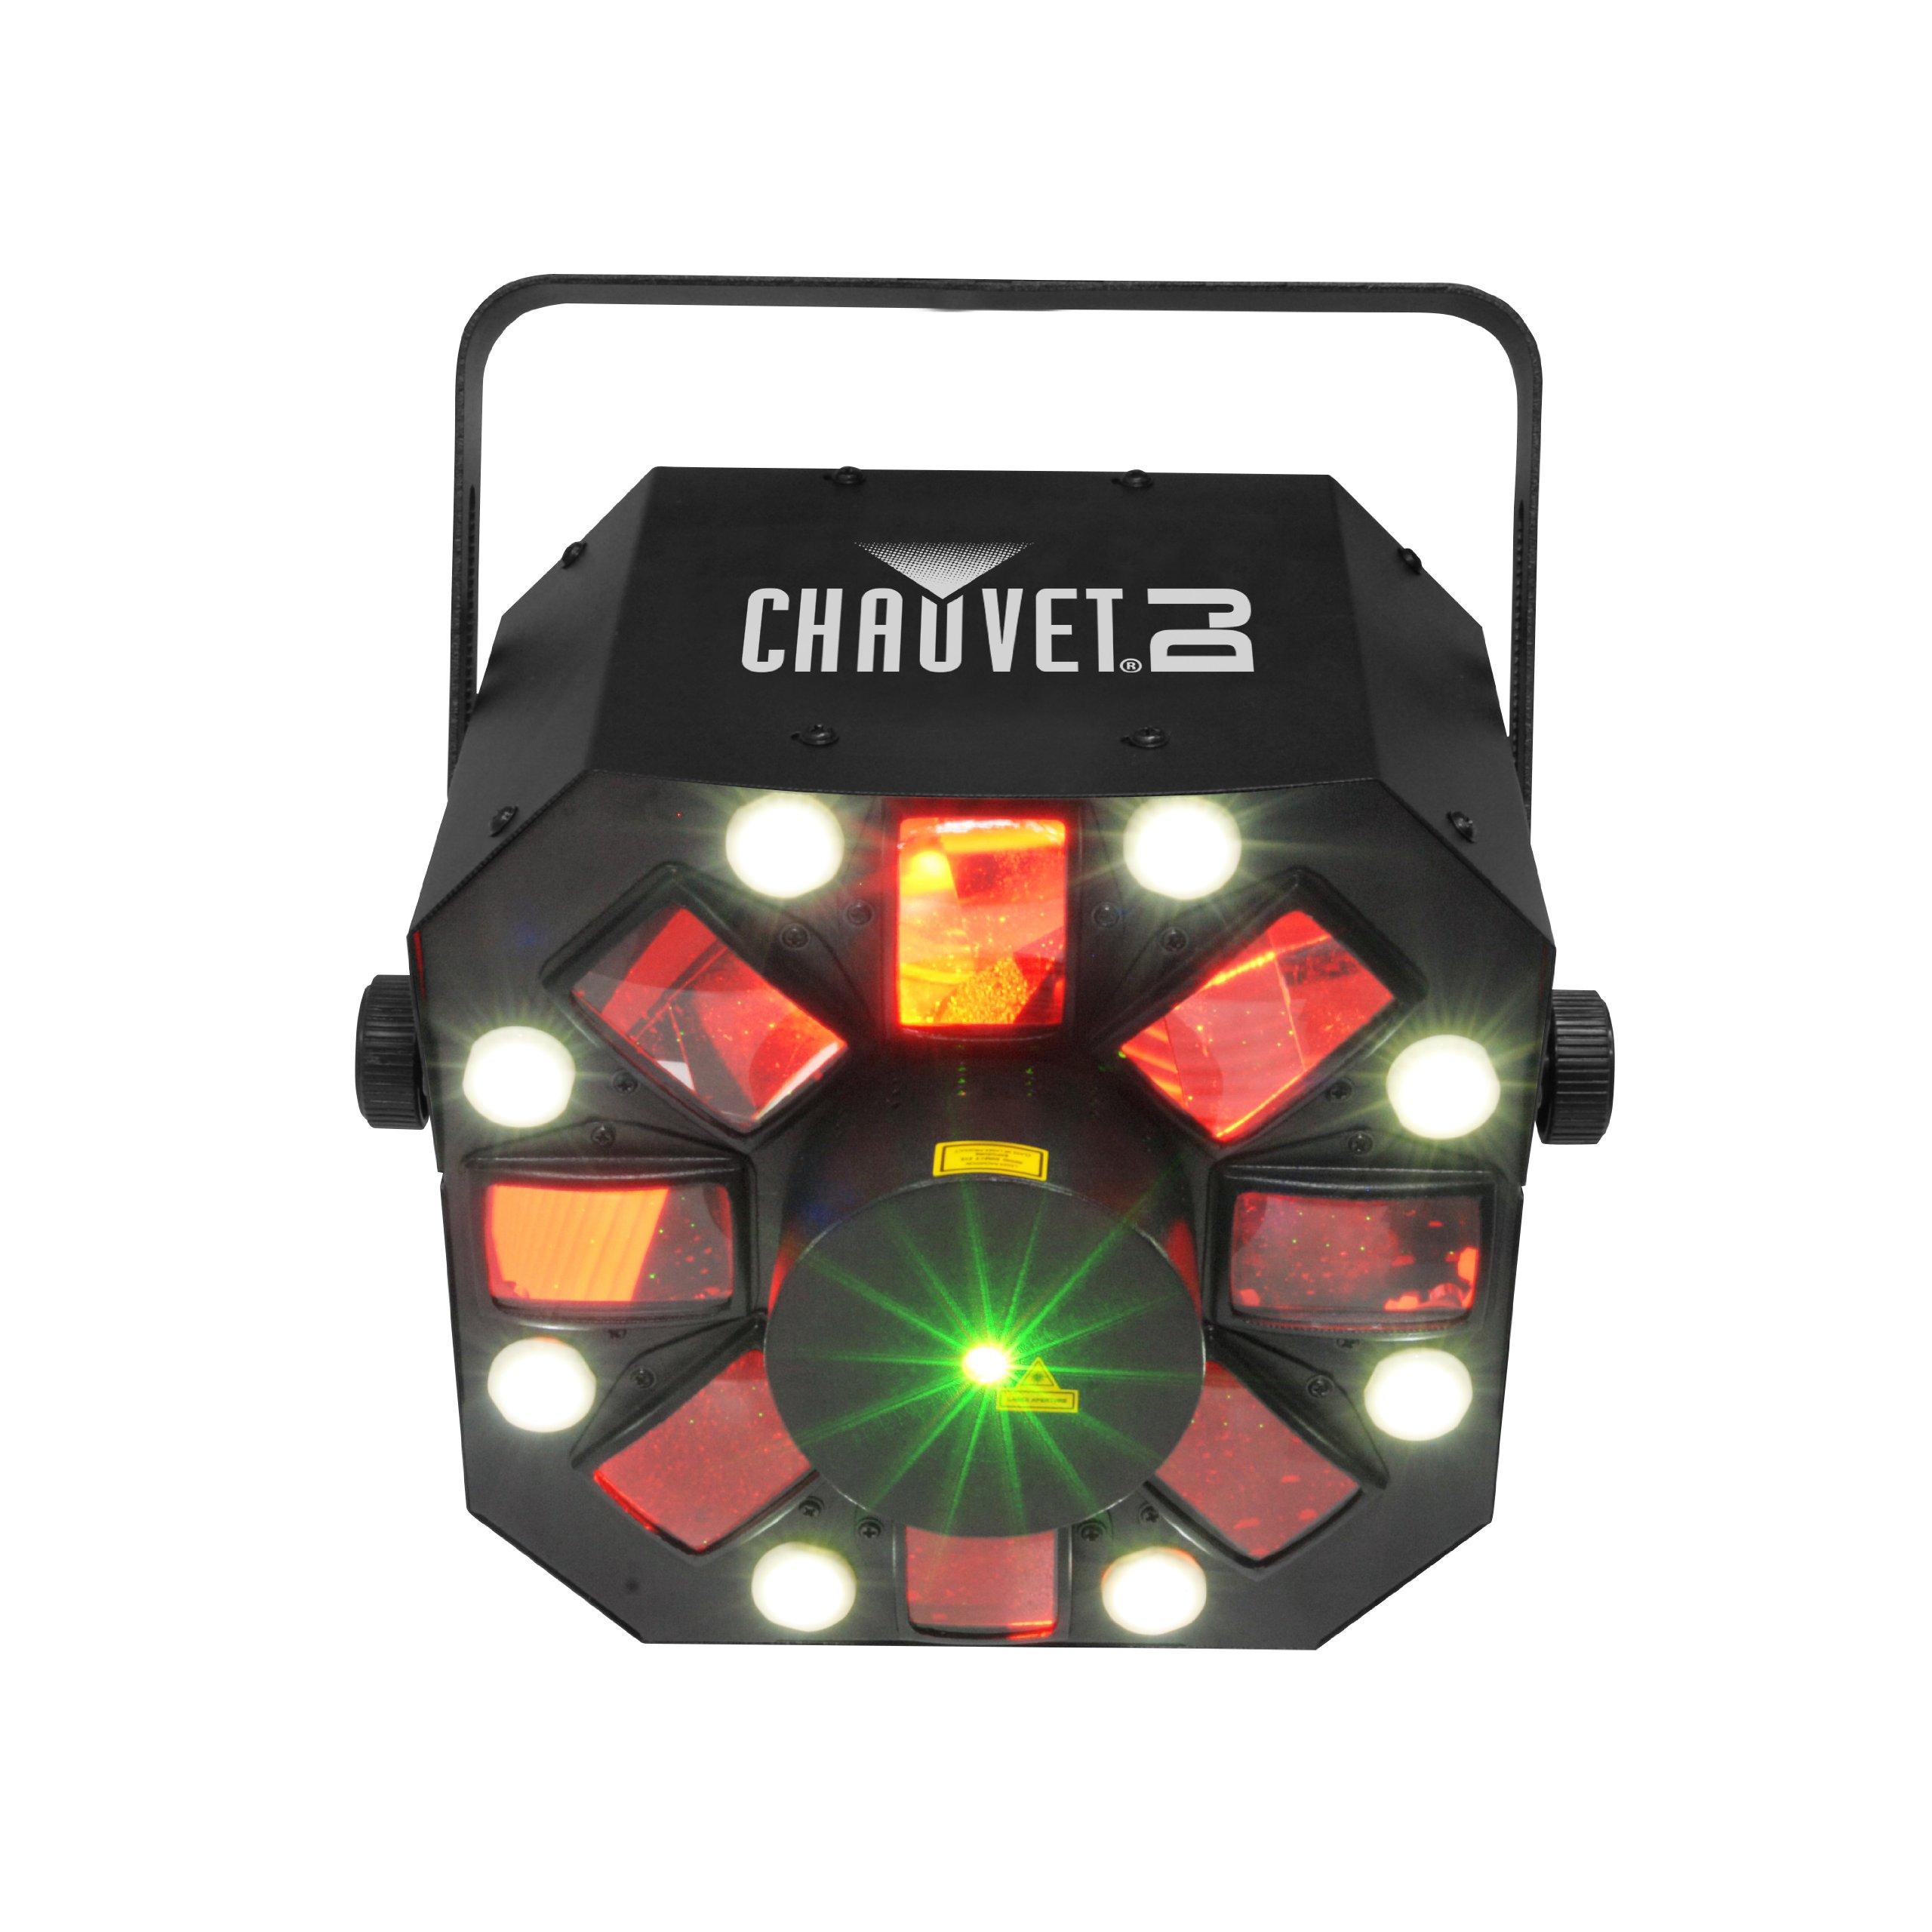 CHAUVET DJ Swarm 5FX 3-in-1 LED Strobe, Laser, Derby Effect Light | Laser & Strobe Effects